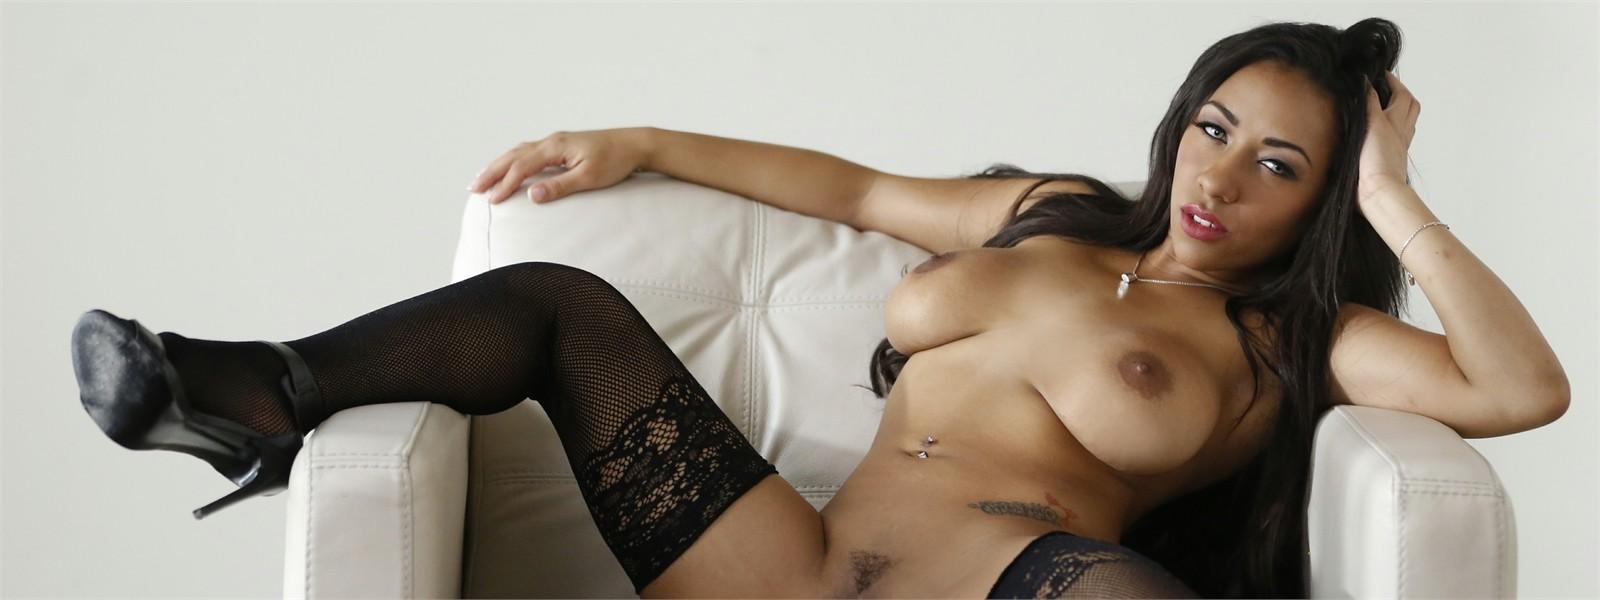 priya price anal